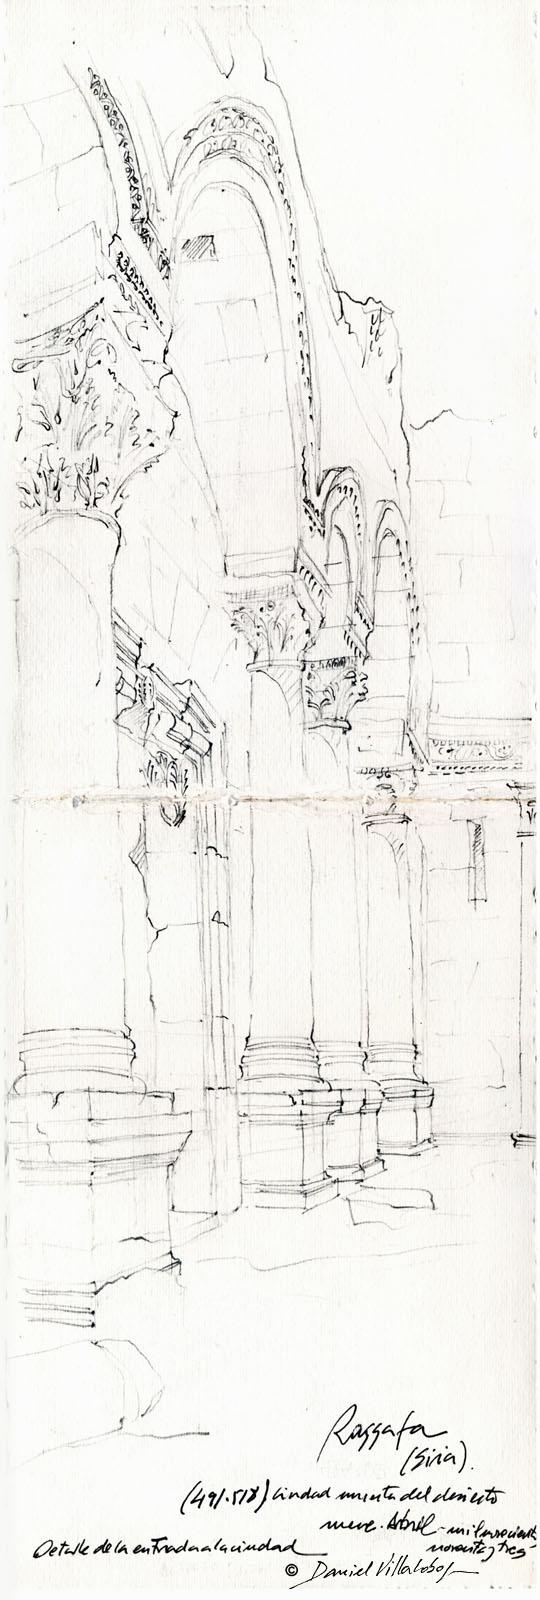 danielvillalobos-sketchbooks-skechtravelsexhibition-06